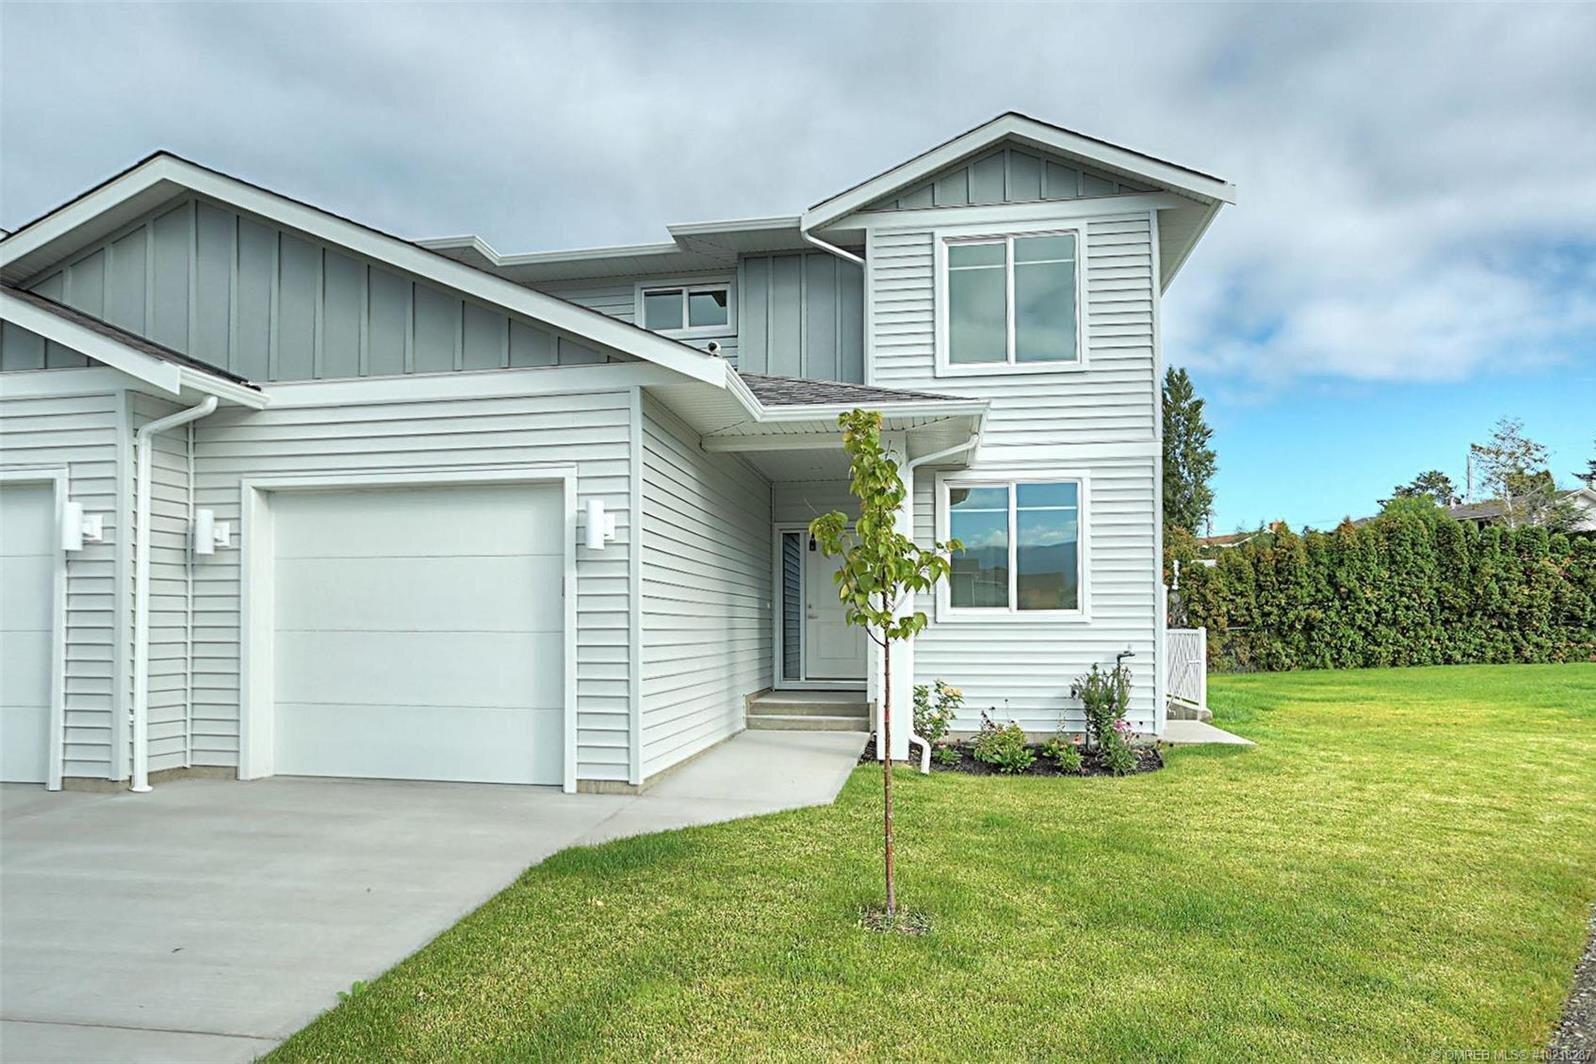 Townhouse for sale at 470 Sugars Ave Kelowna British Columbia - MLS: 10218287